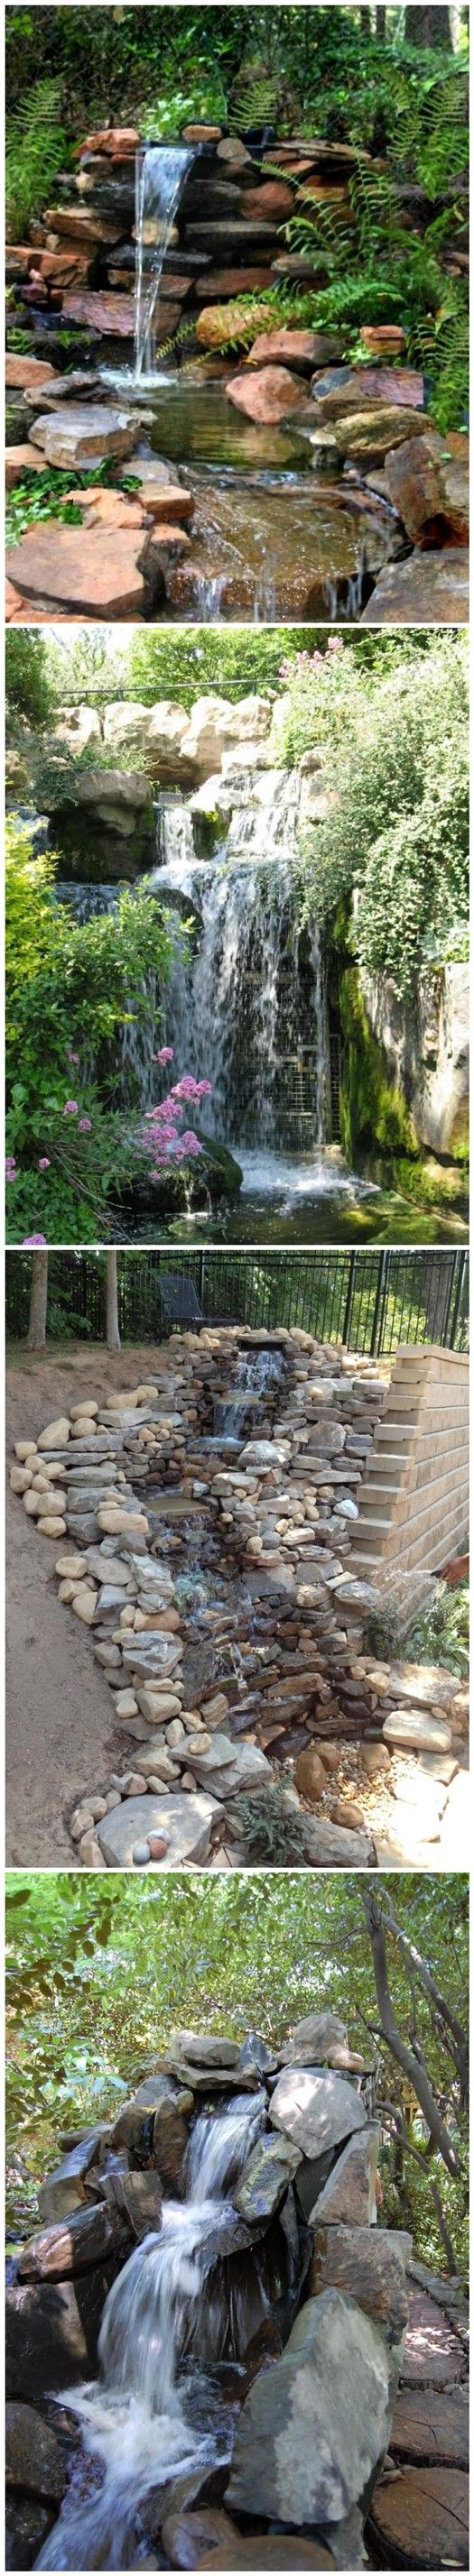 How to build a garden waterfall pond 1 c for Cascadas para jardines pequenos